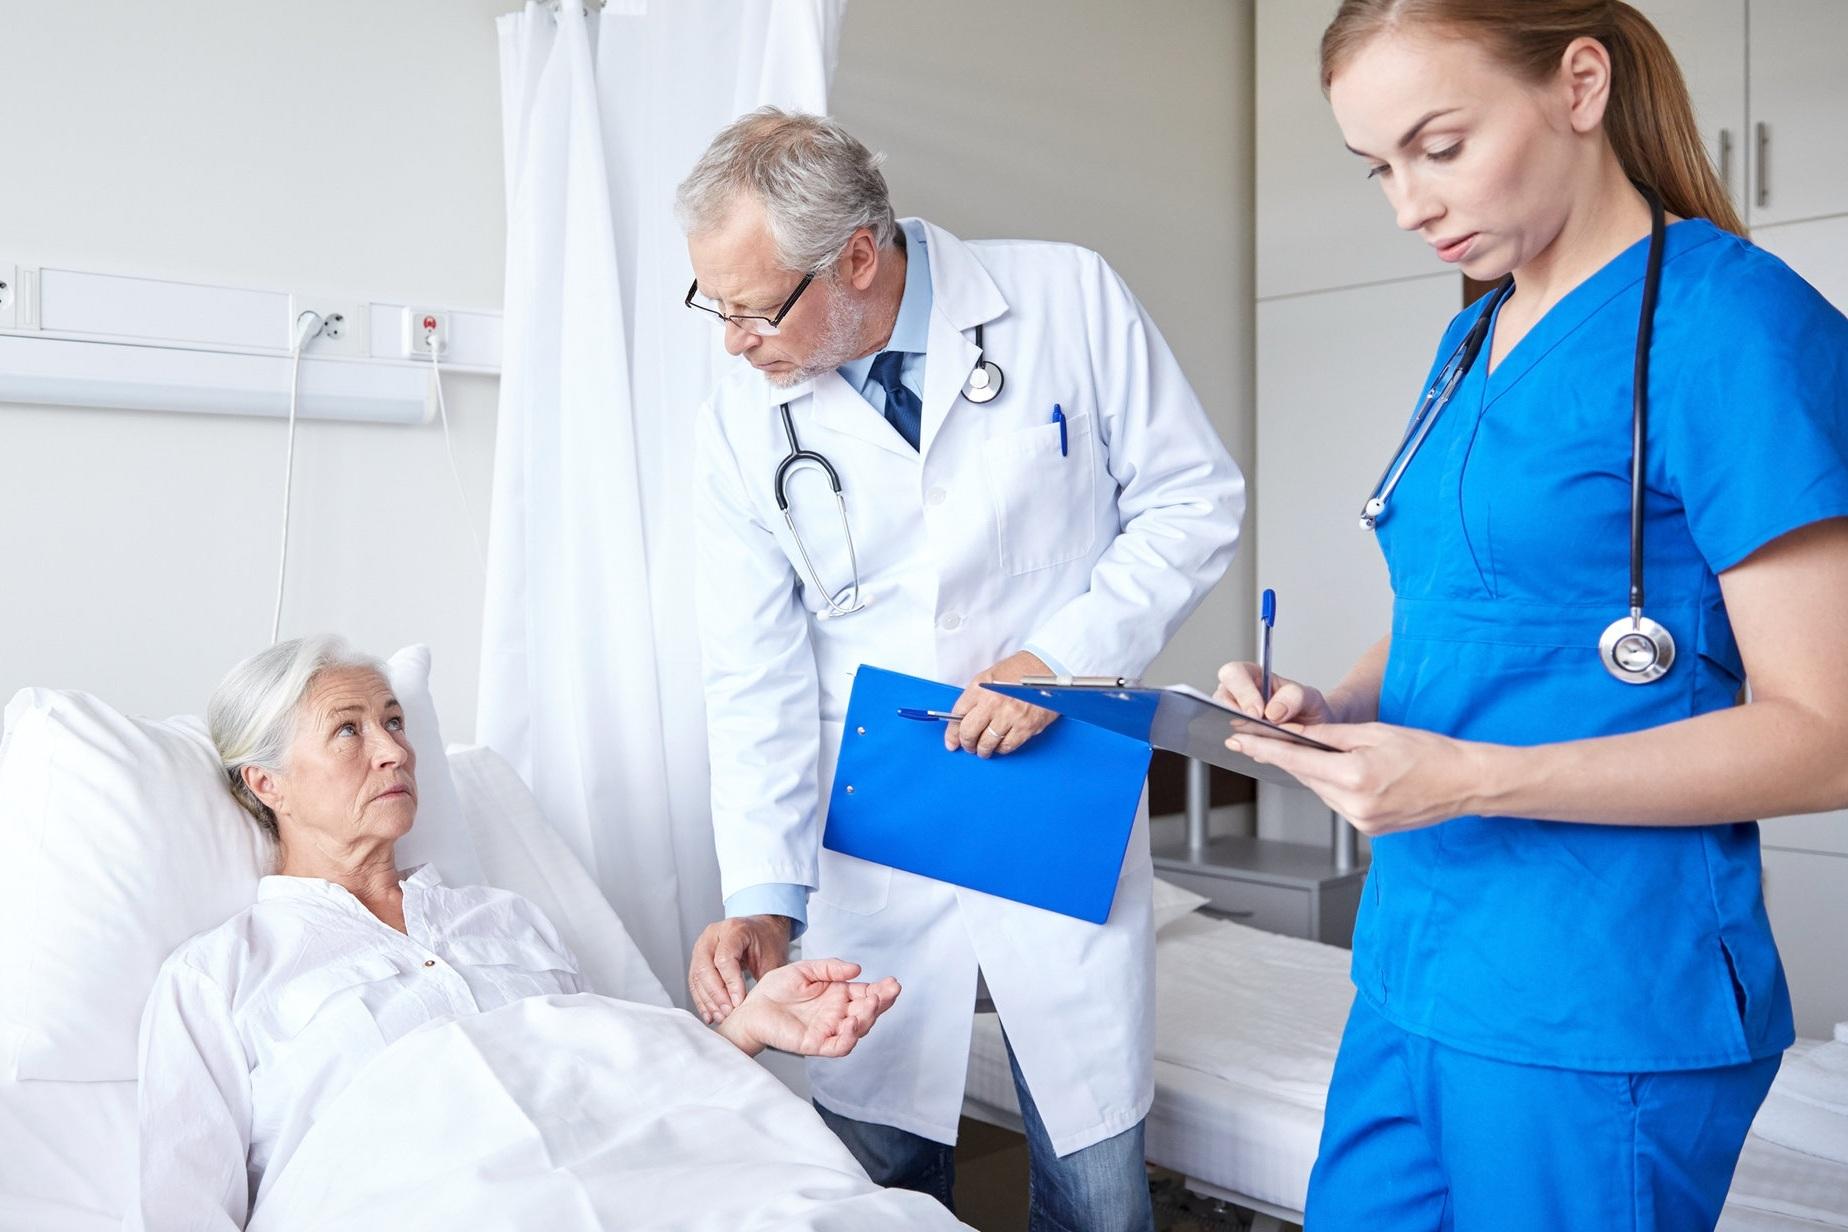 bigstock-medicine-age-health-care-and-99310340.jpg